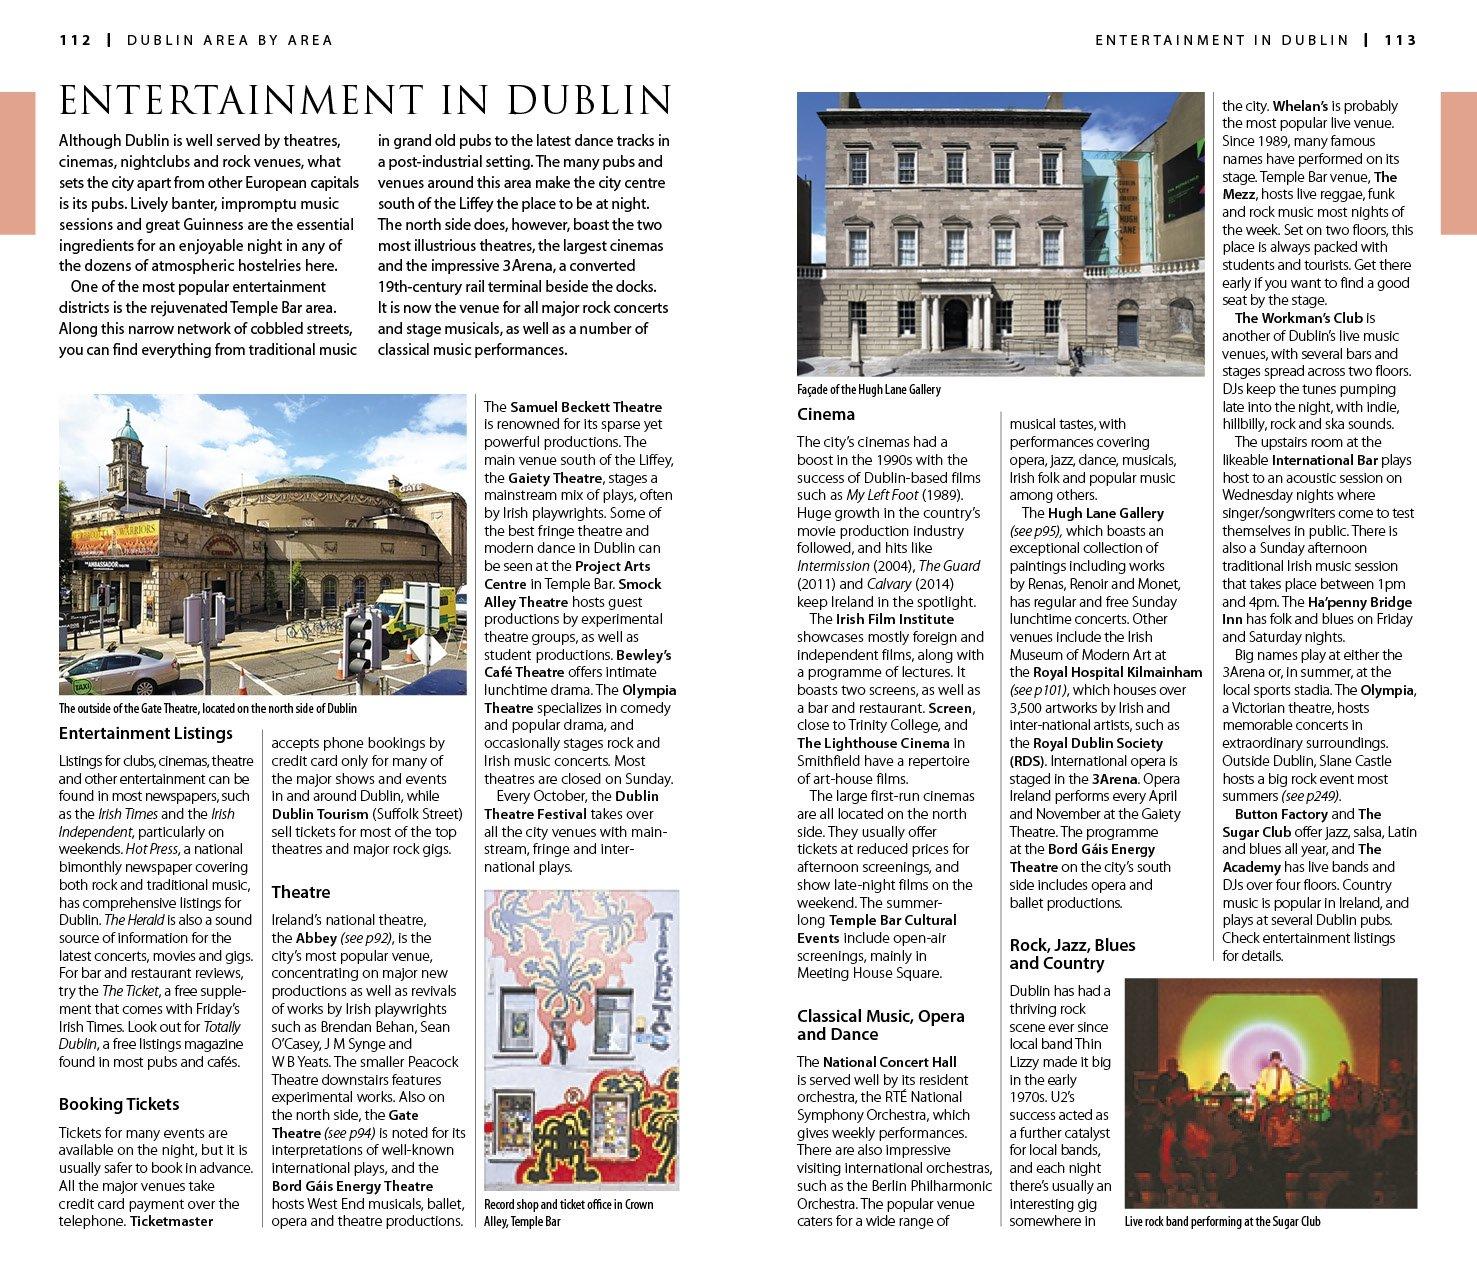 DK Eyewitness Travel Guide Ireland: DK Travel: 9781465441195: Amazon.com:  Books